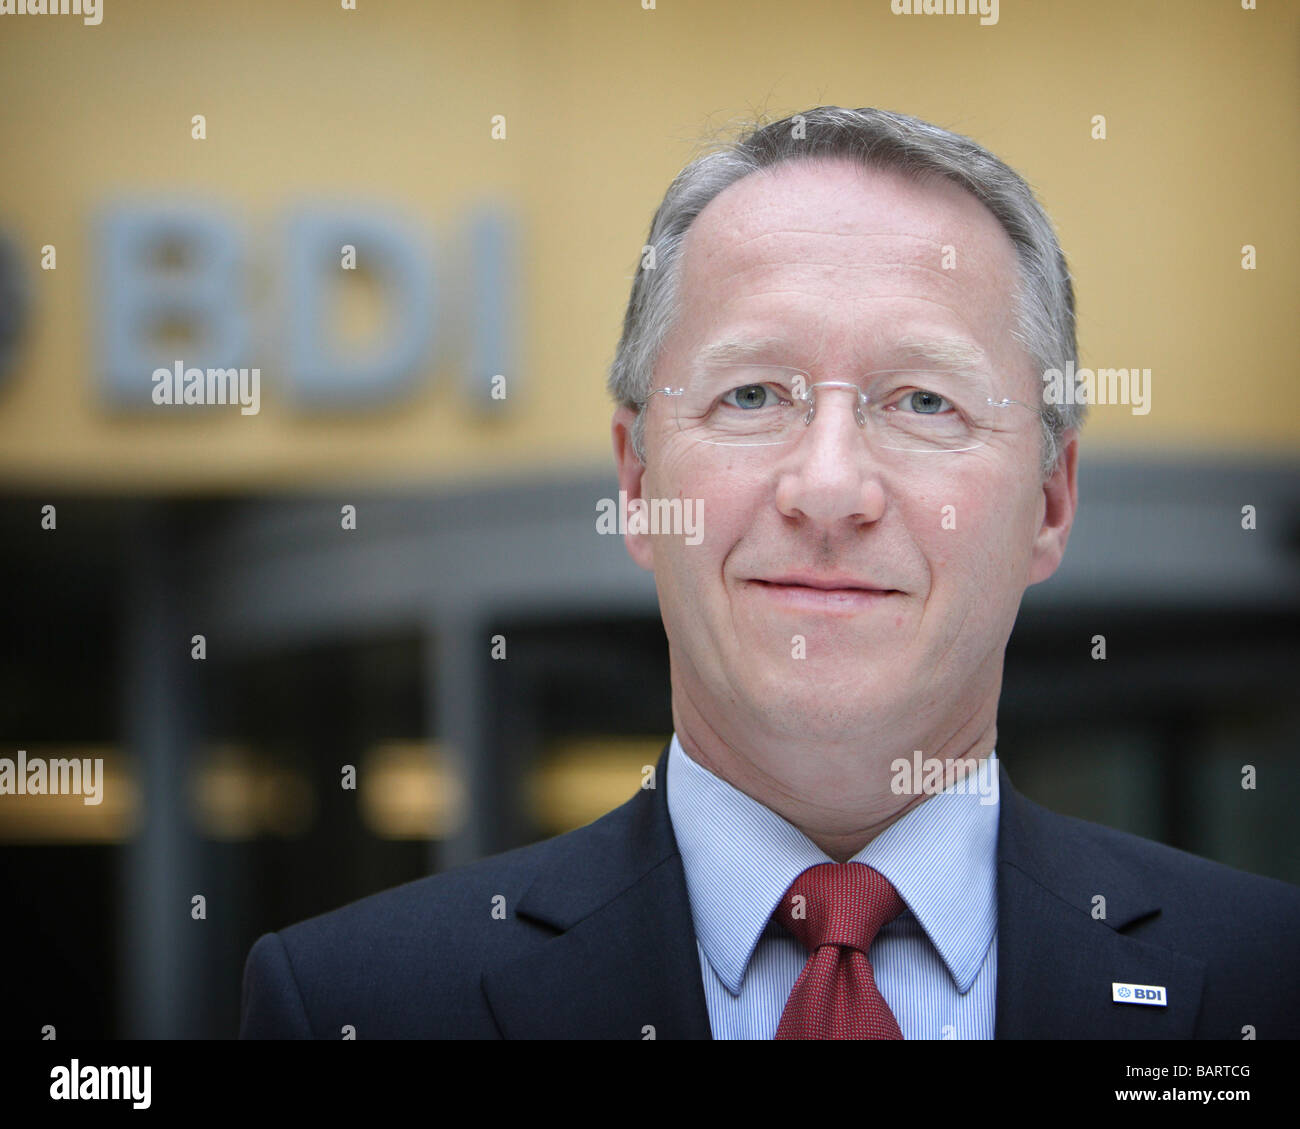 Werner SCHNAPPAUF President of the BDI Berlin Germany - Stock Image